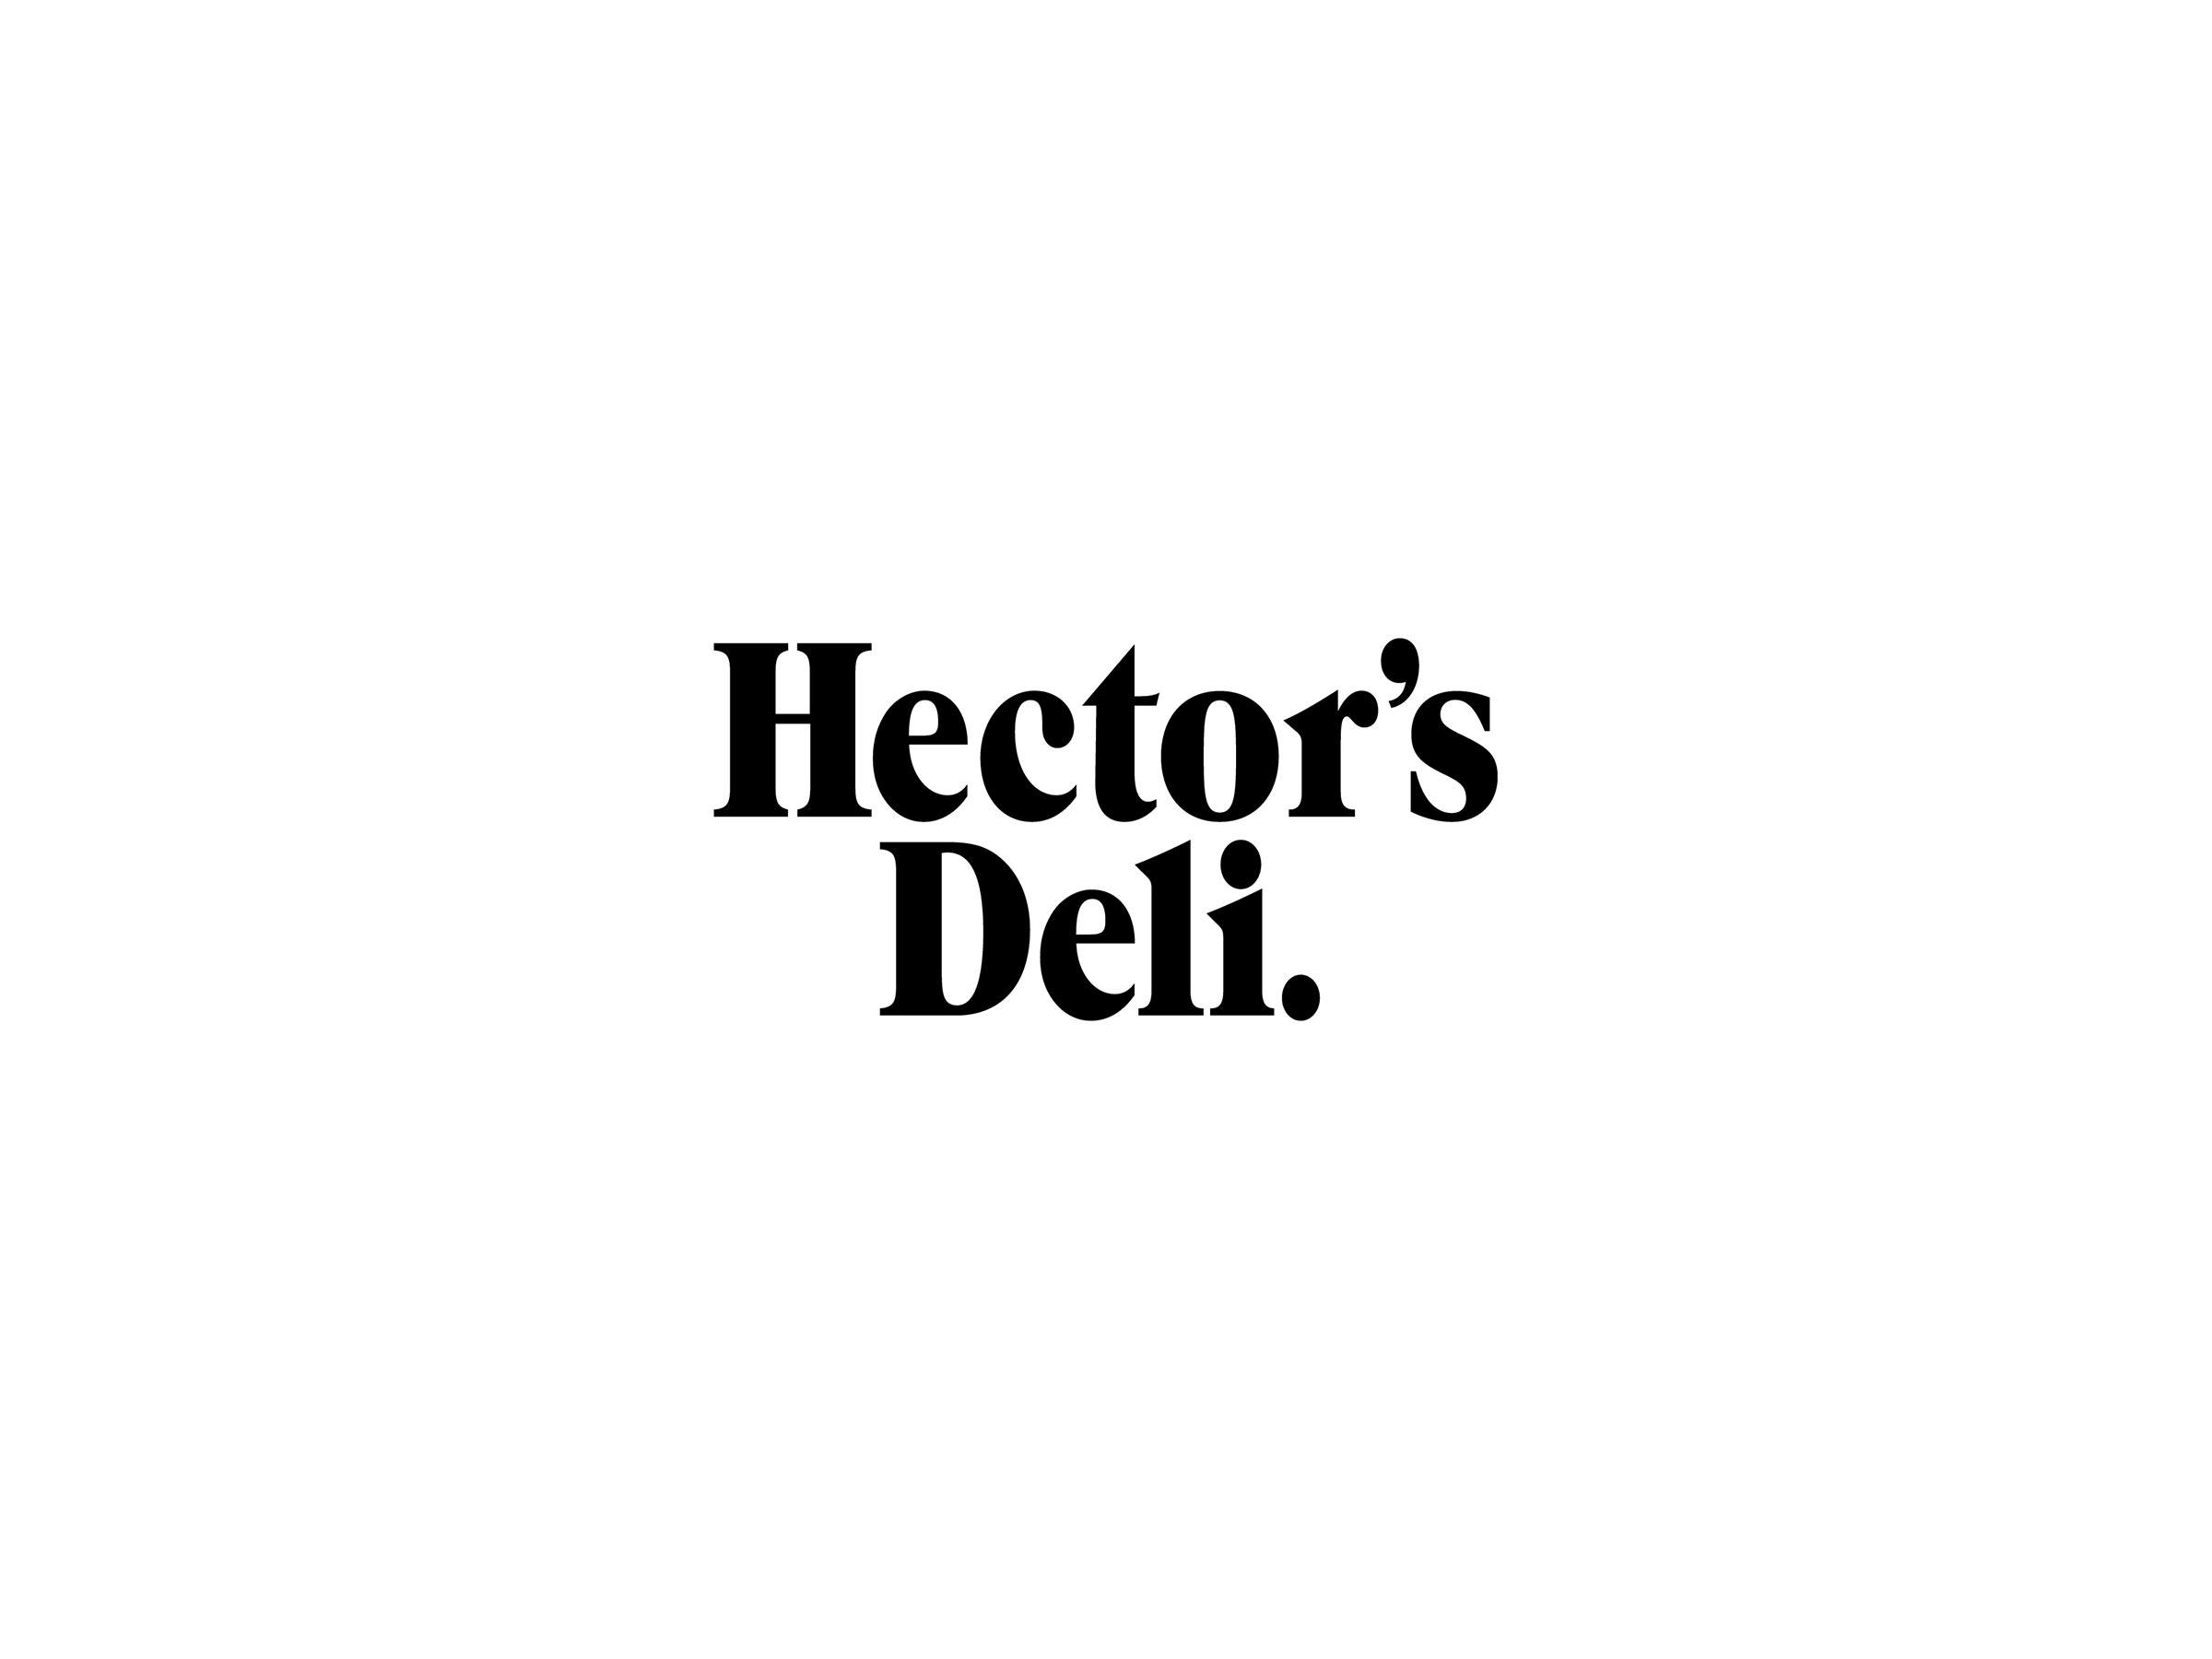 Hector's Deli